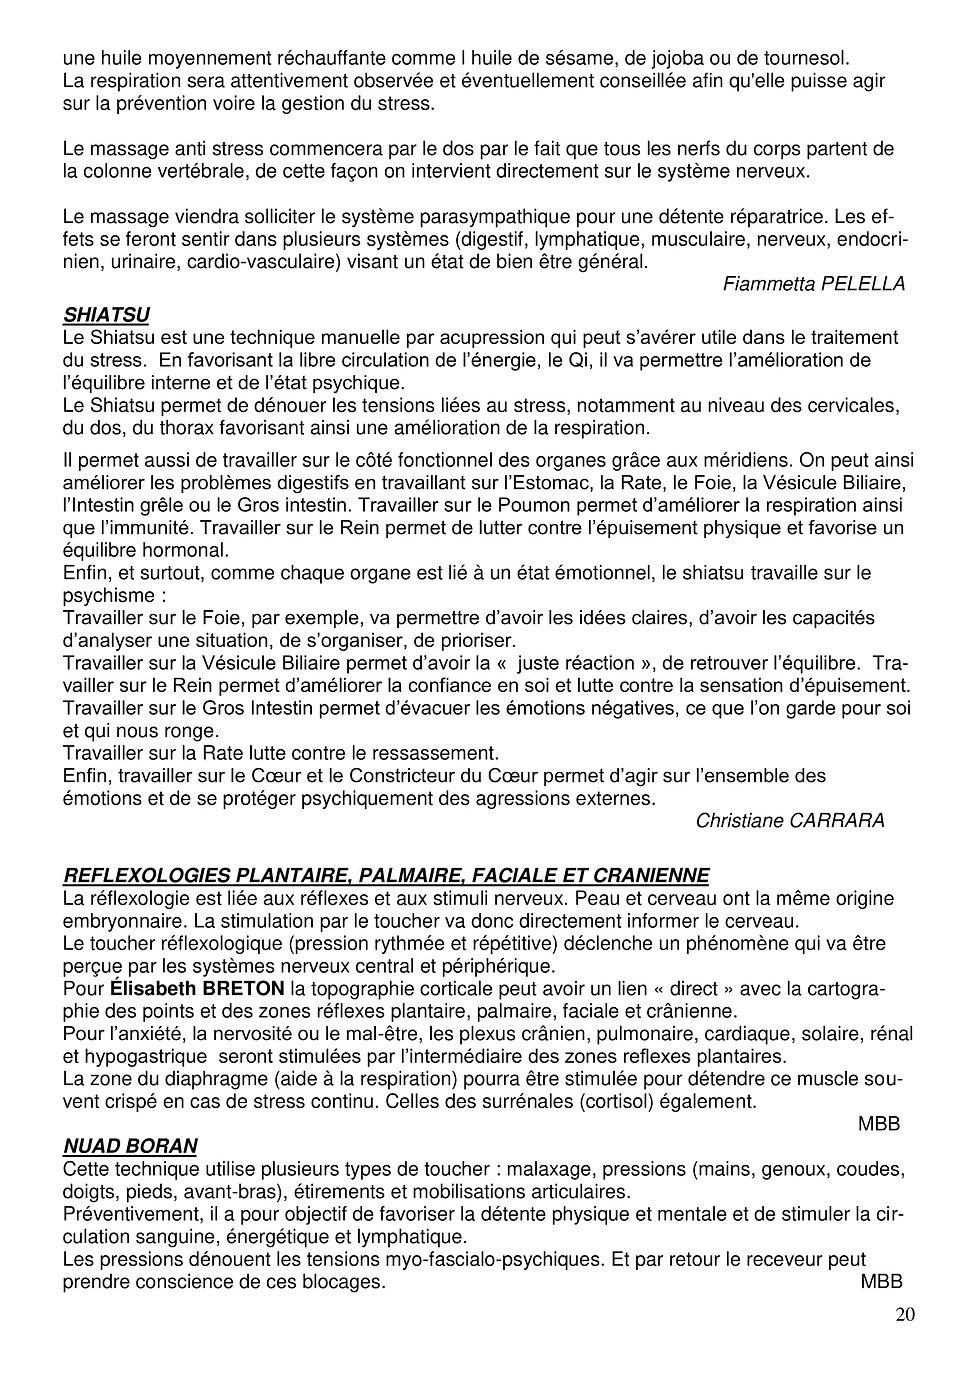 STRESS_et_ÉMOTIONS-20.jpg